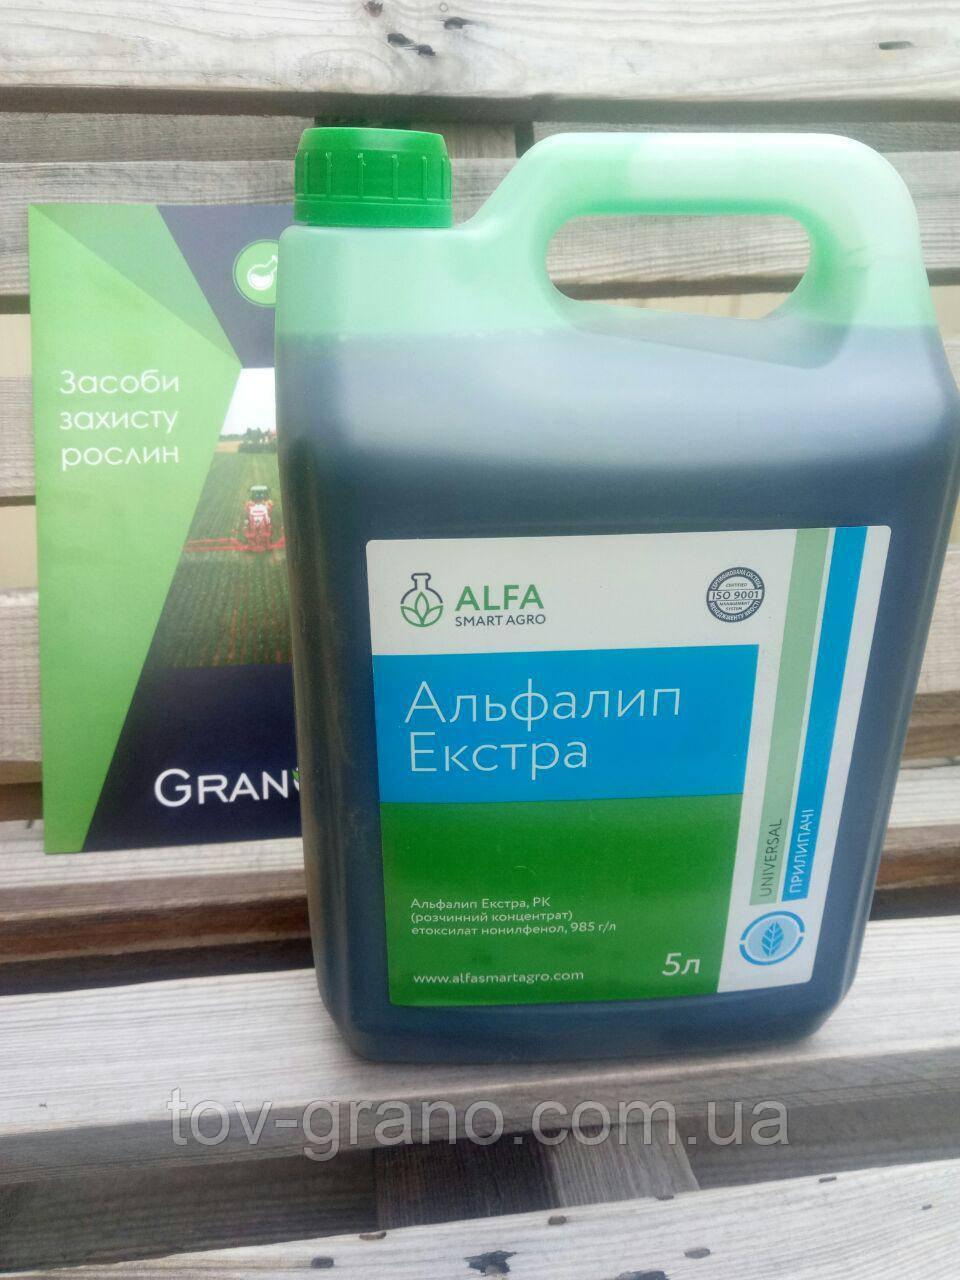 Прилипач Альфалип Екстра (ALFA Smart Agro)